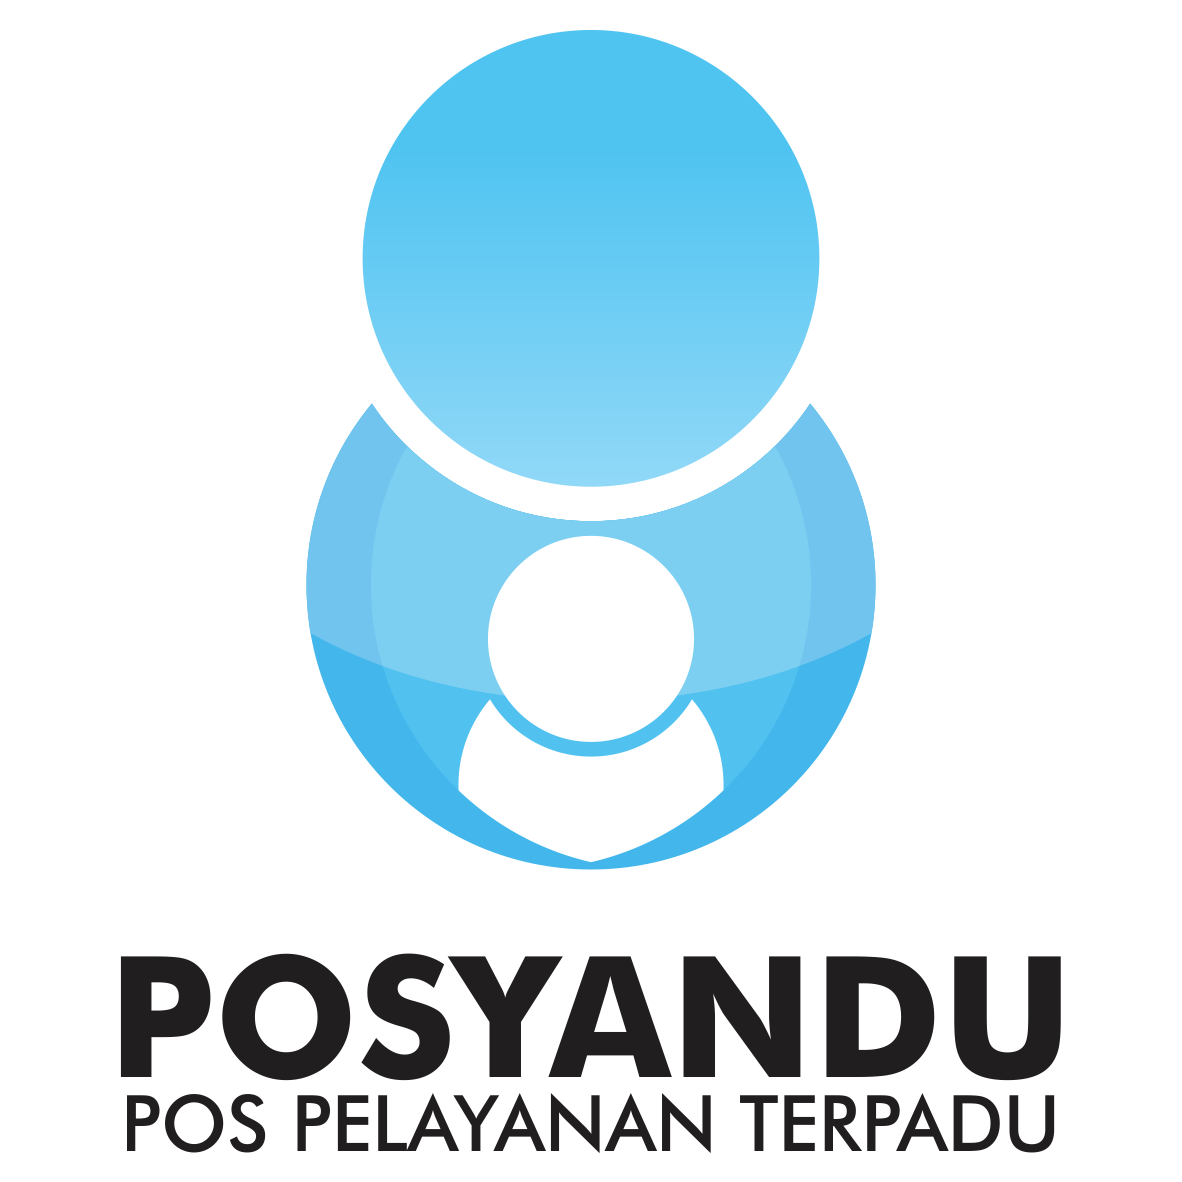 Logo Posyandu Vector Svg Cdr Ai Eps Png File Desain